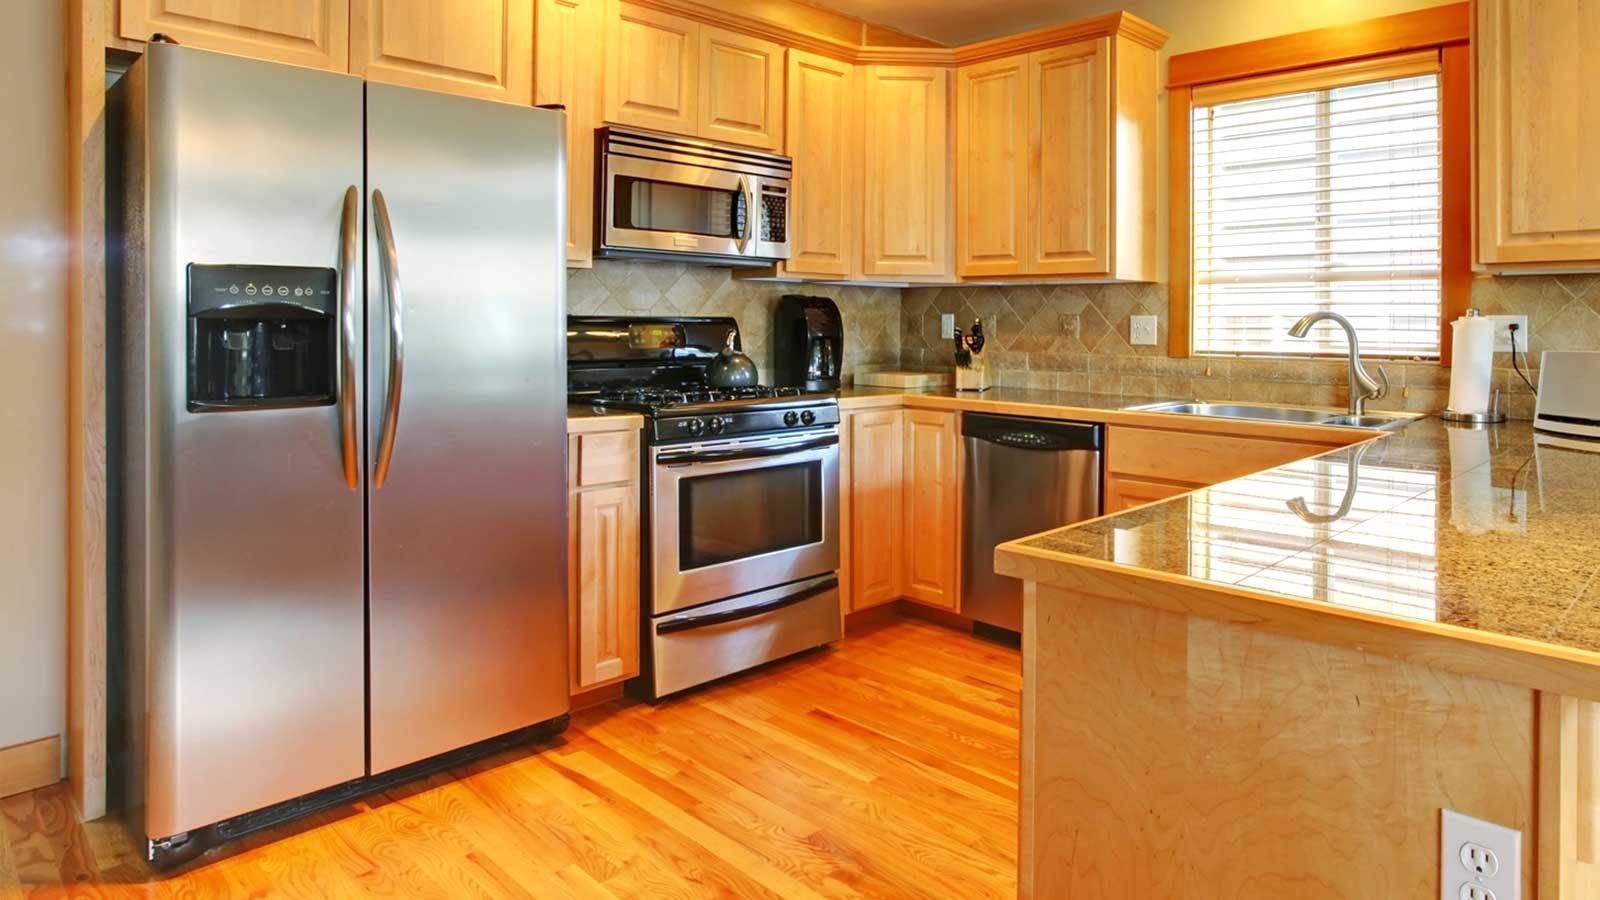 Frigorificos con estilo americano - Cocinas con frigorifico americano ...